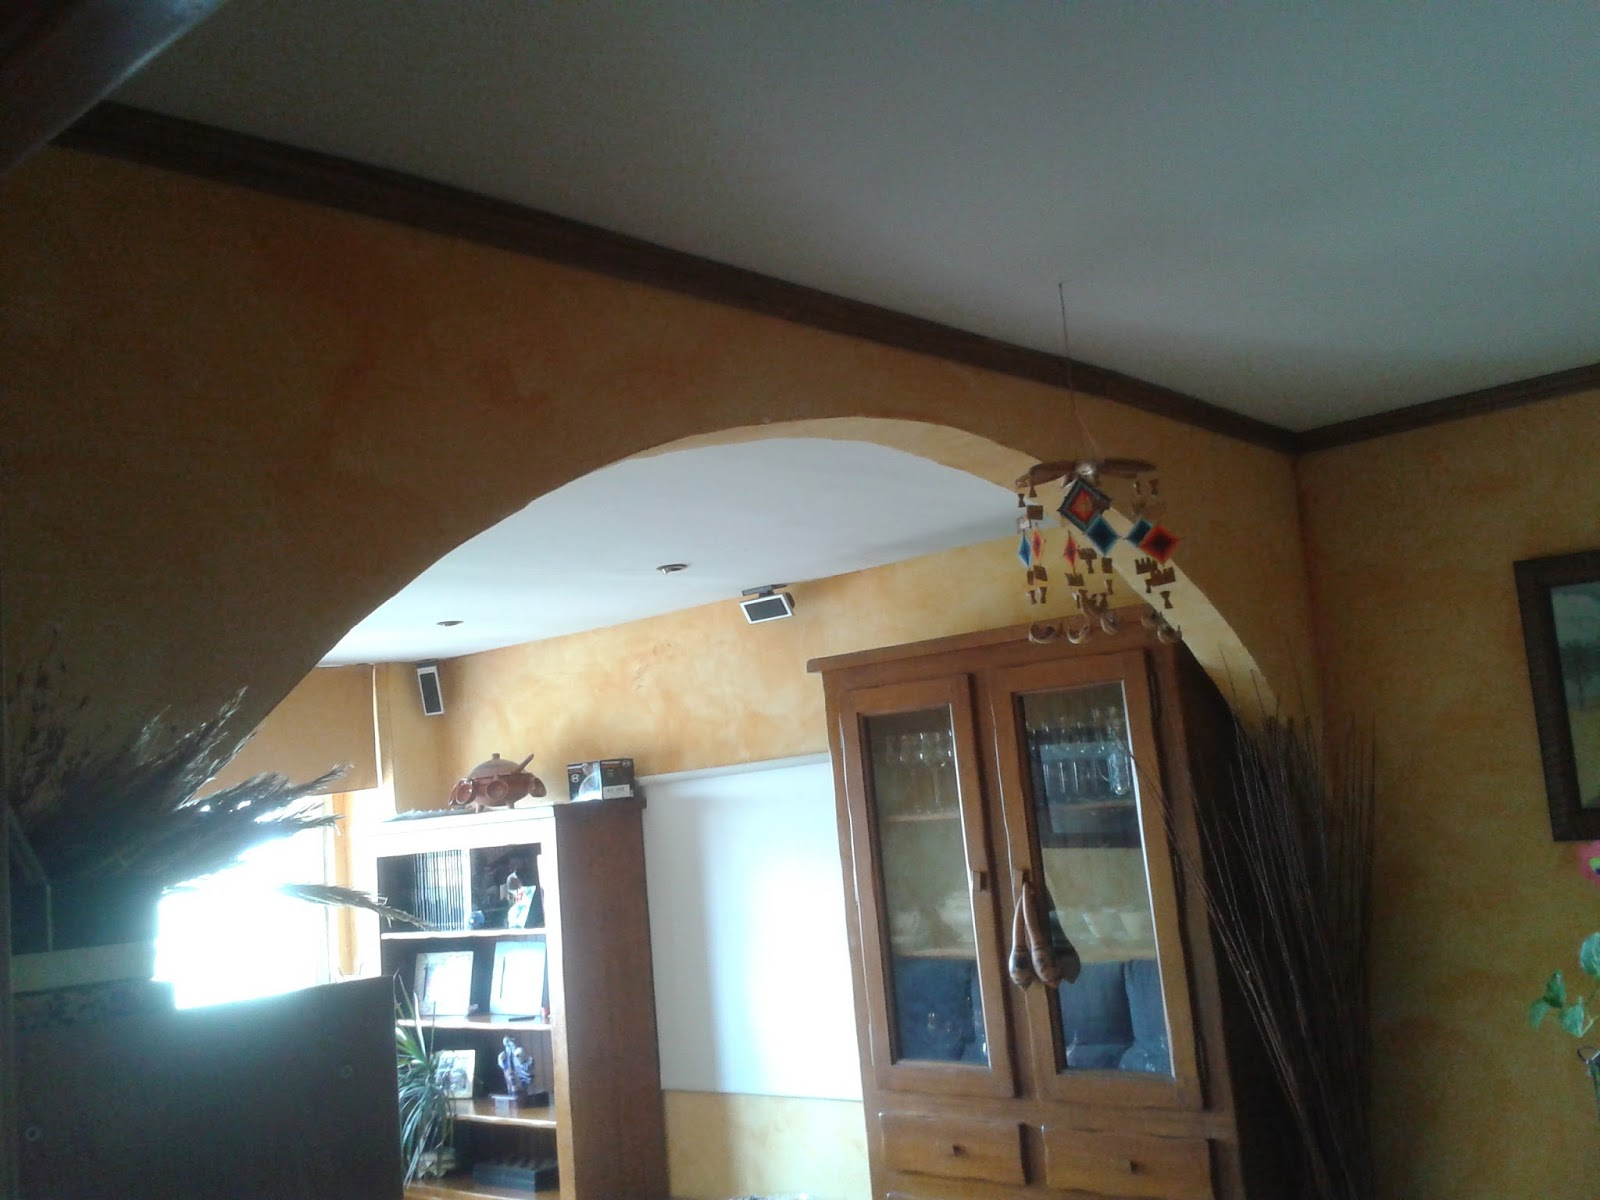 Reparaciones muy economicas para tu hogar arcos decorativos - Falso techo decorativo ...